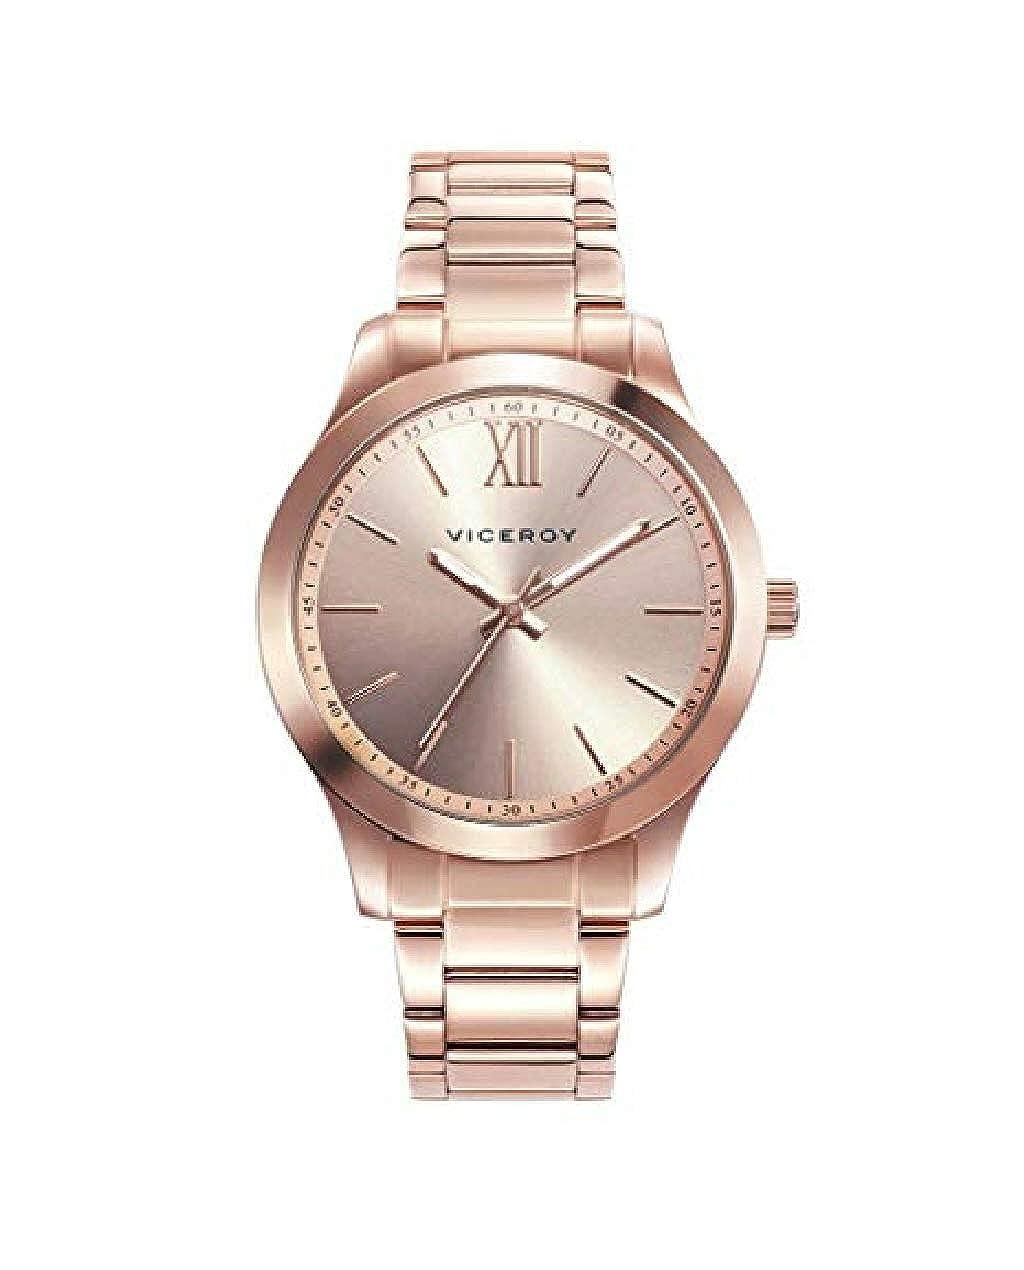 39936c1b6e45 Viceroy 401068-93 - Reloj para Mujer Acero IP Oro Rosa  Amazon.es  Relojes